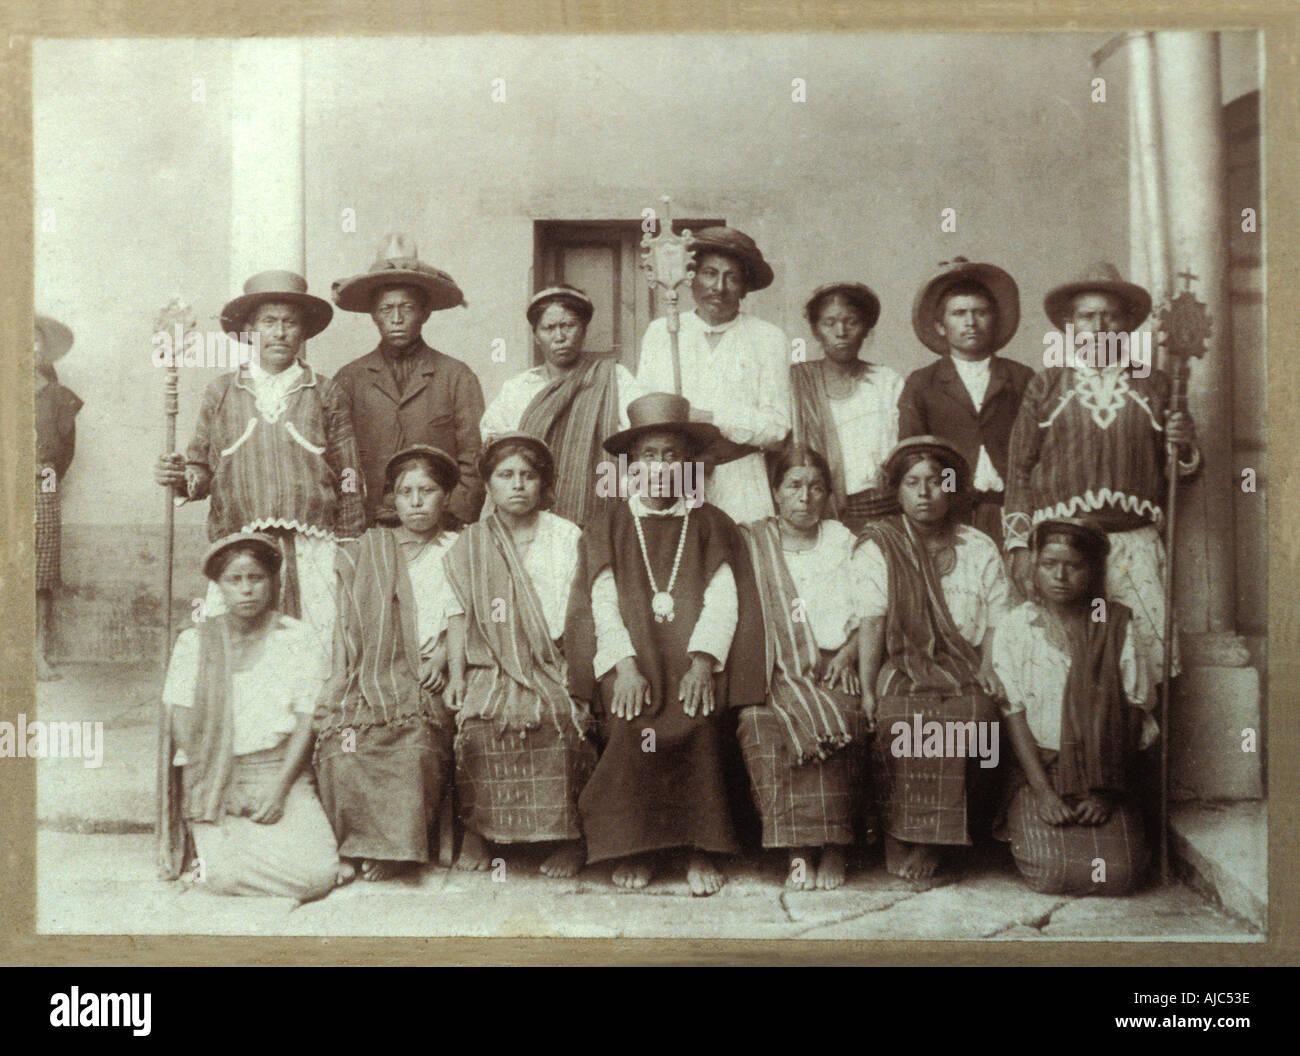 Vintage photo c1910 1915 depicting a group of Tzutujil Maya in traditional costume Santiago Atitlan Guatemala - Stock Image